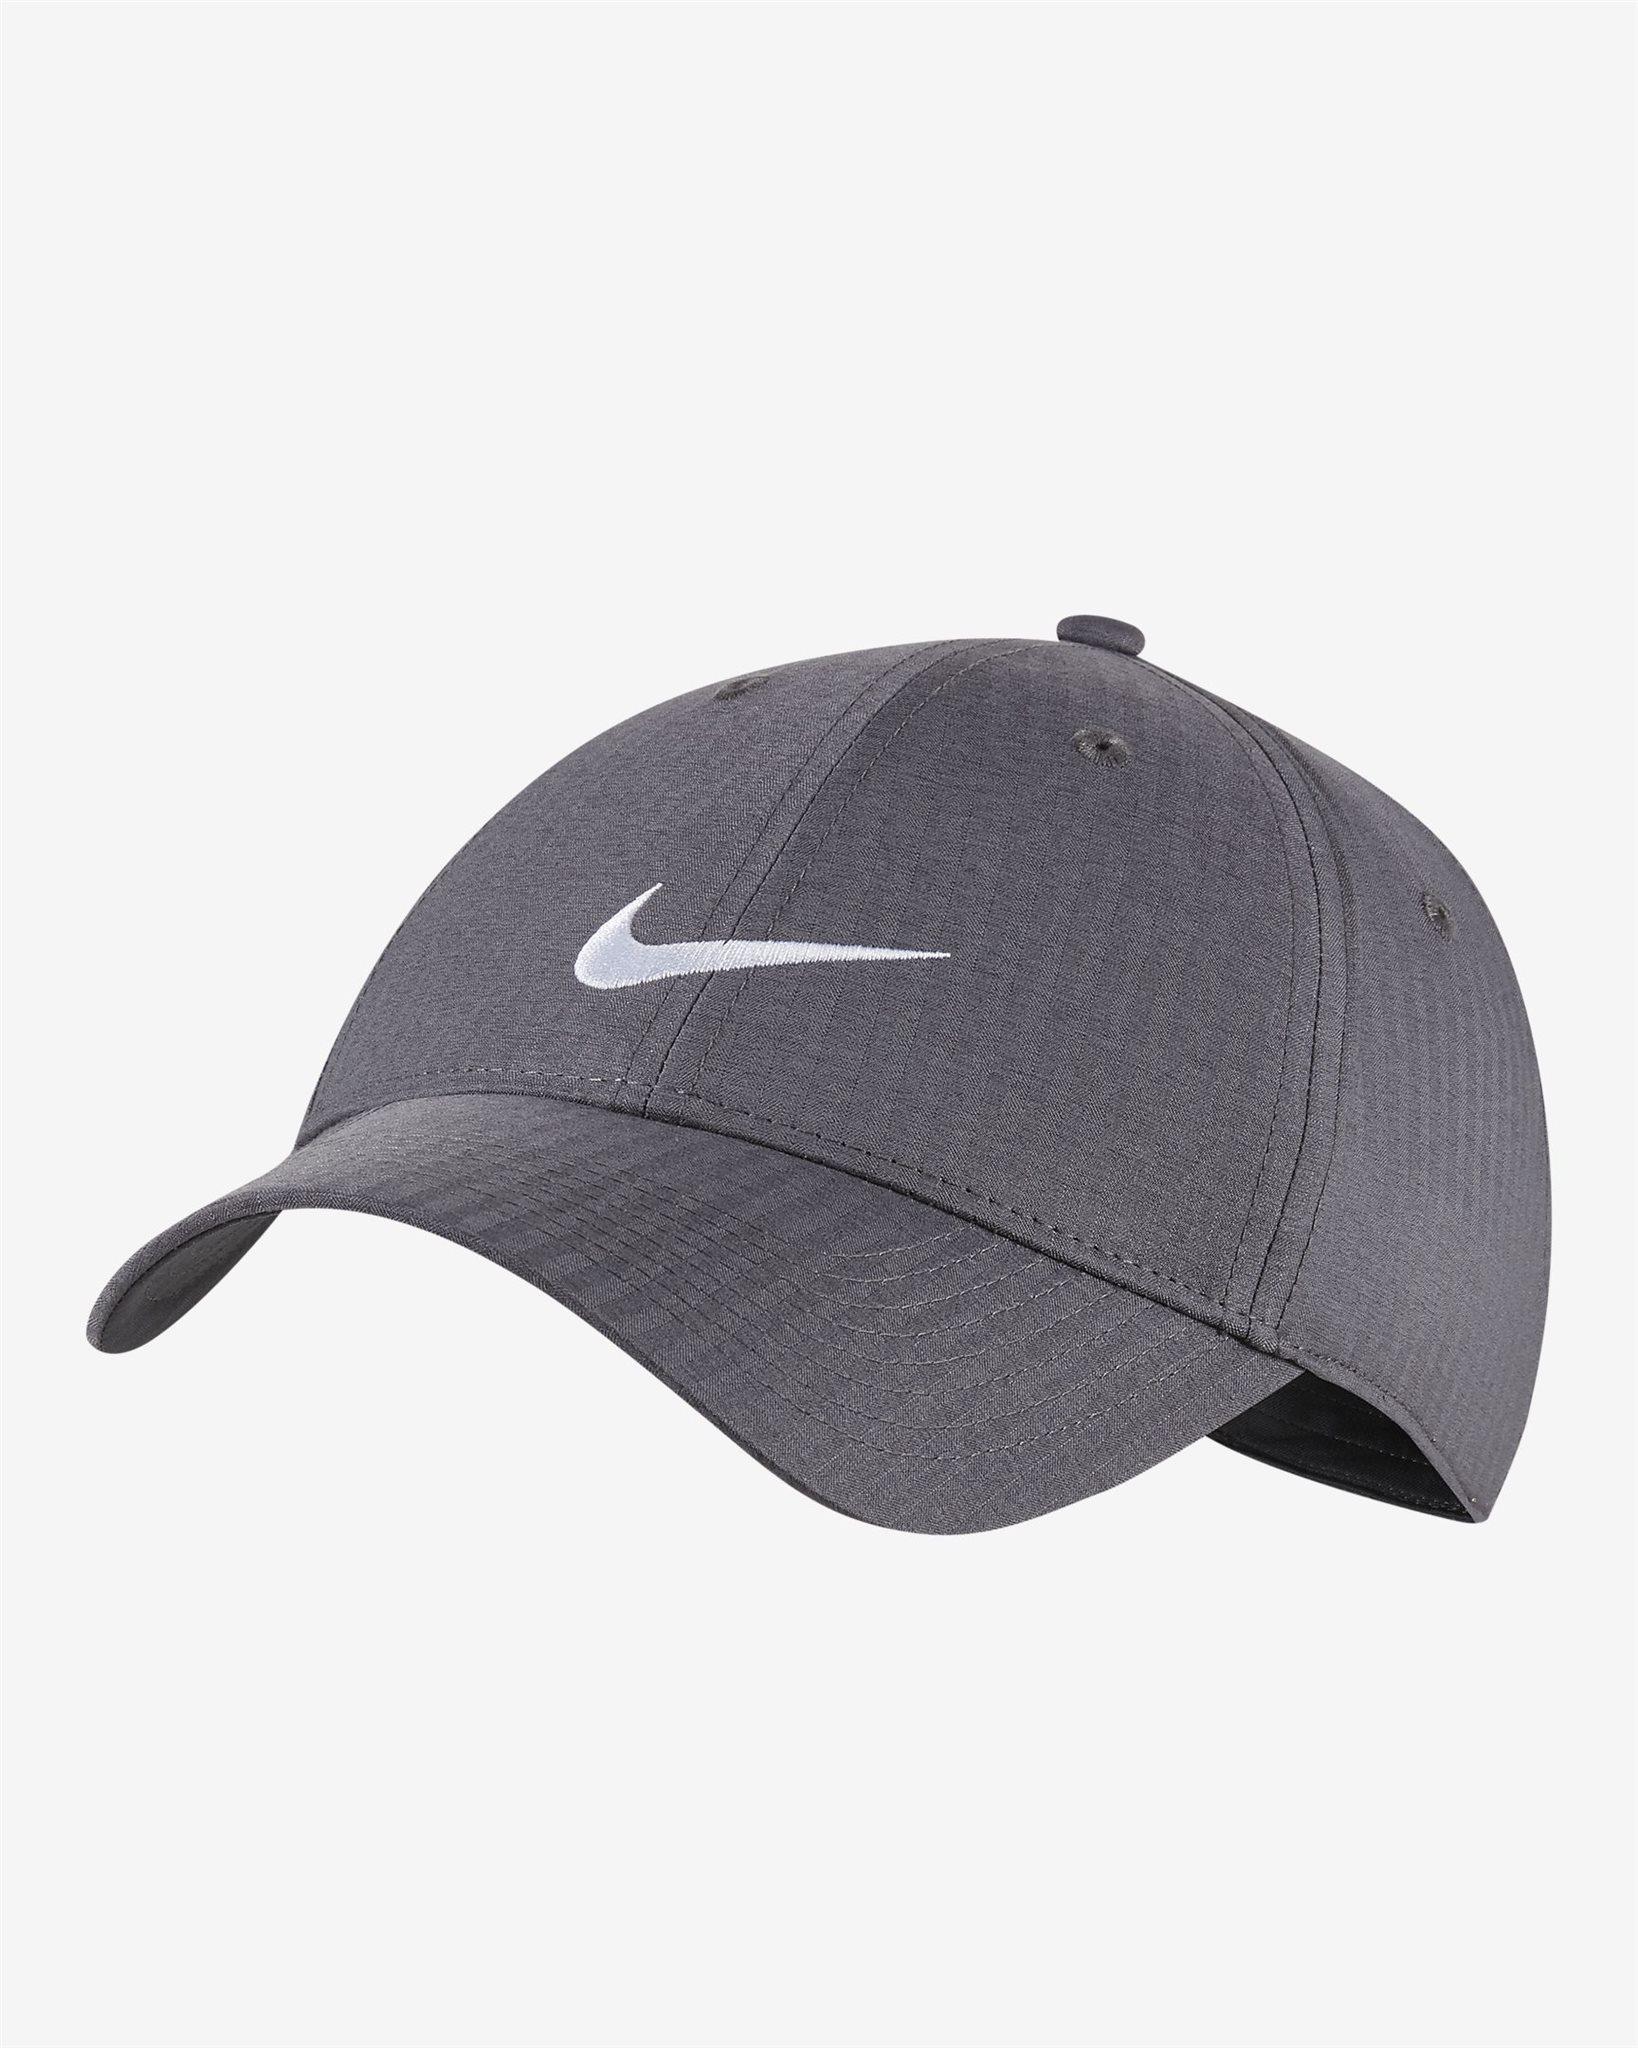 Nike golfpet Legacy91 Tech Cap grijs